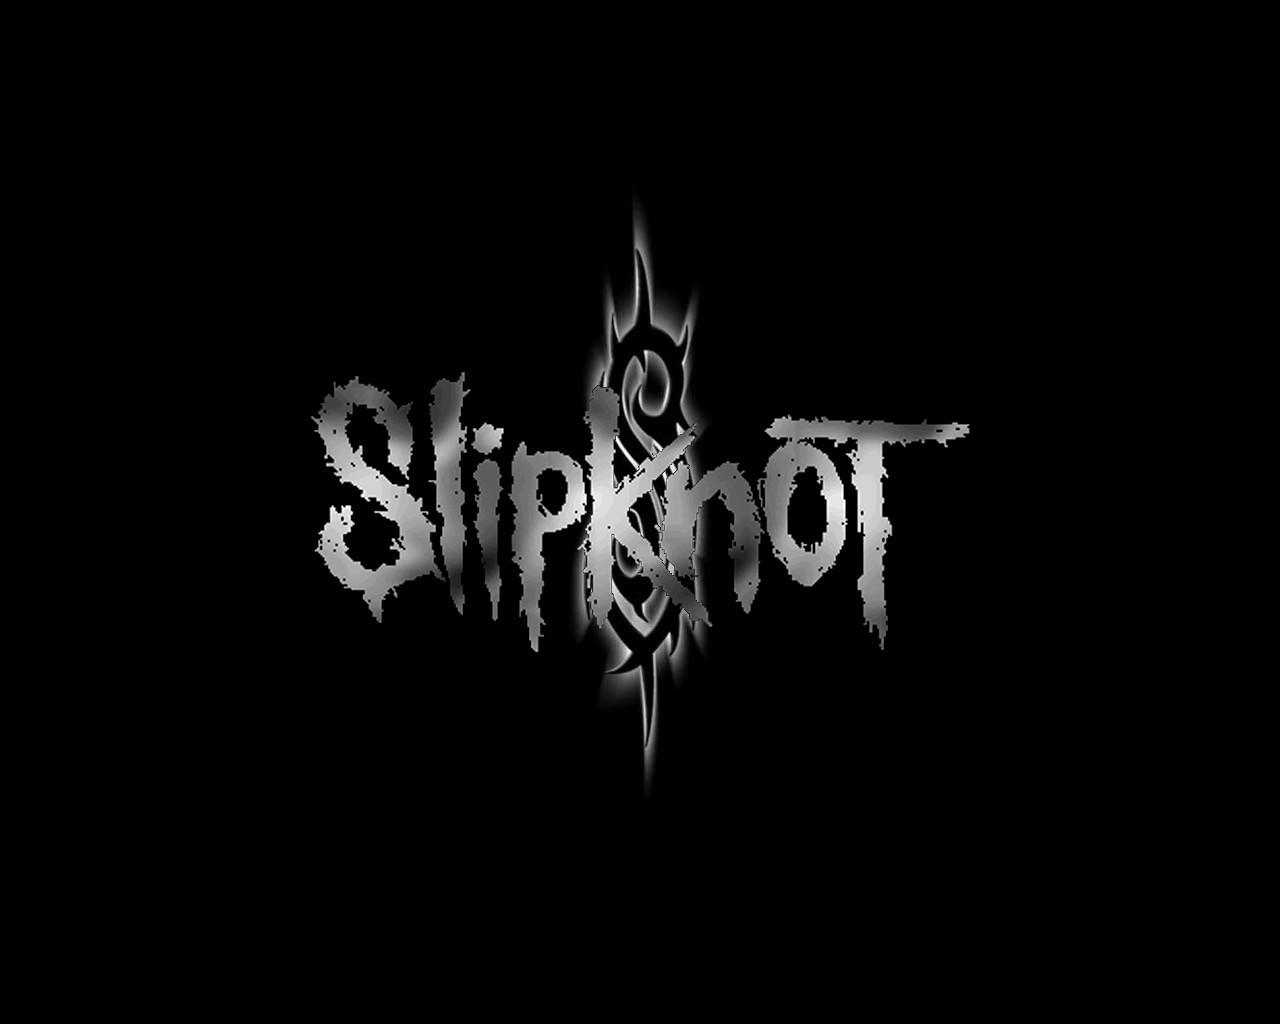 Jeffrey Urias Slipknot 1280x1024